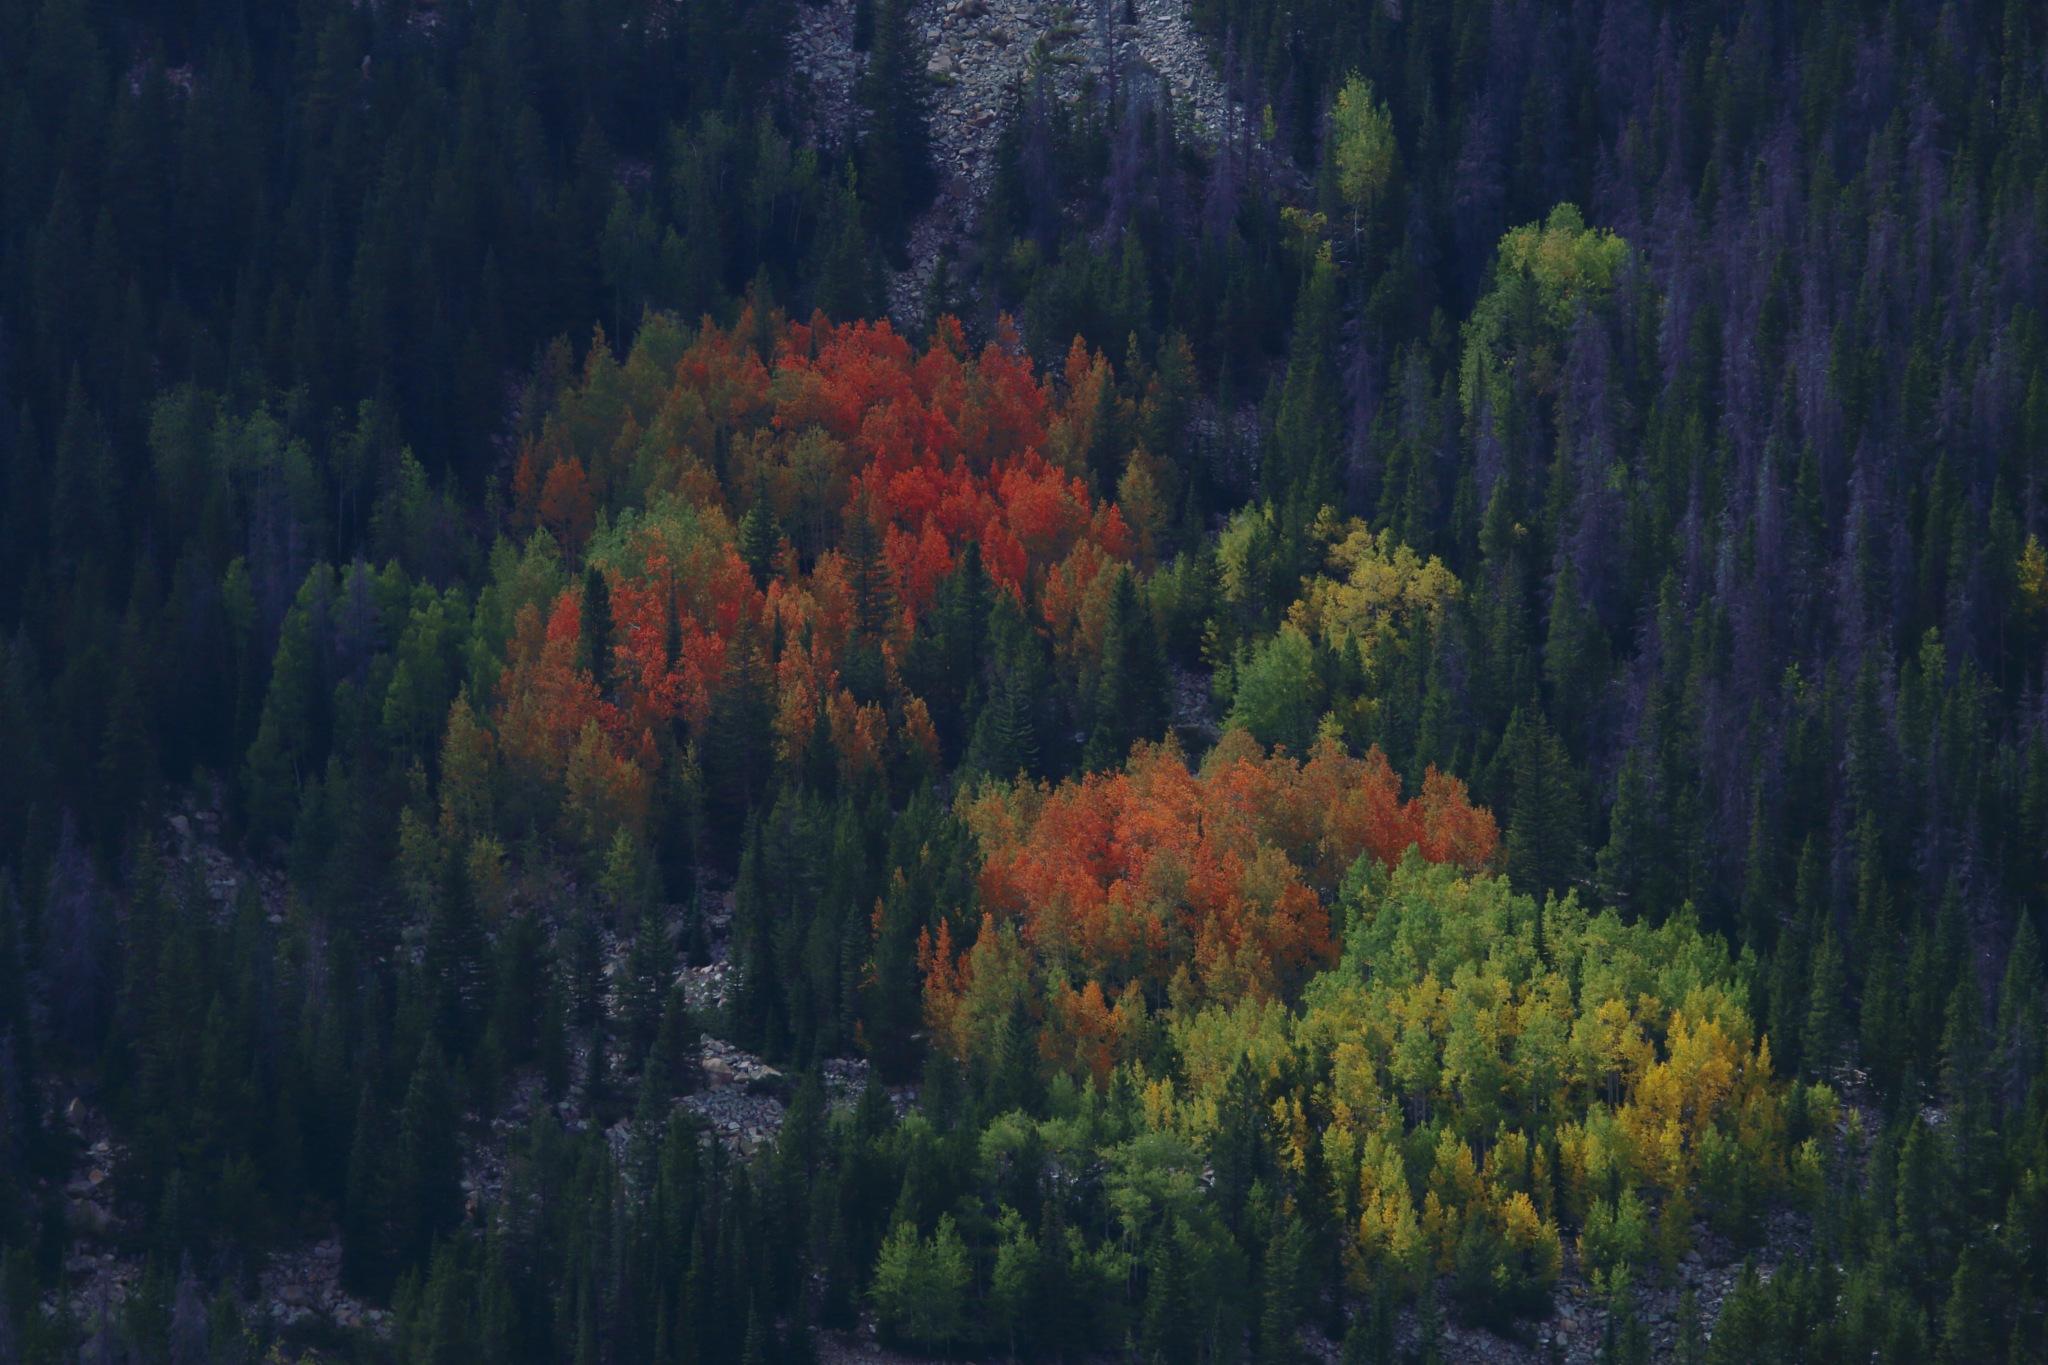 Last Pocket of Color by daniel.luna.77920